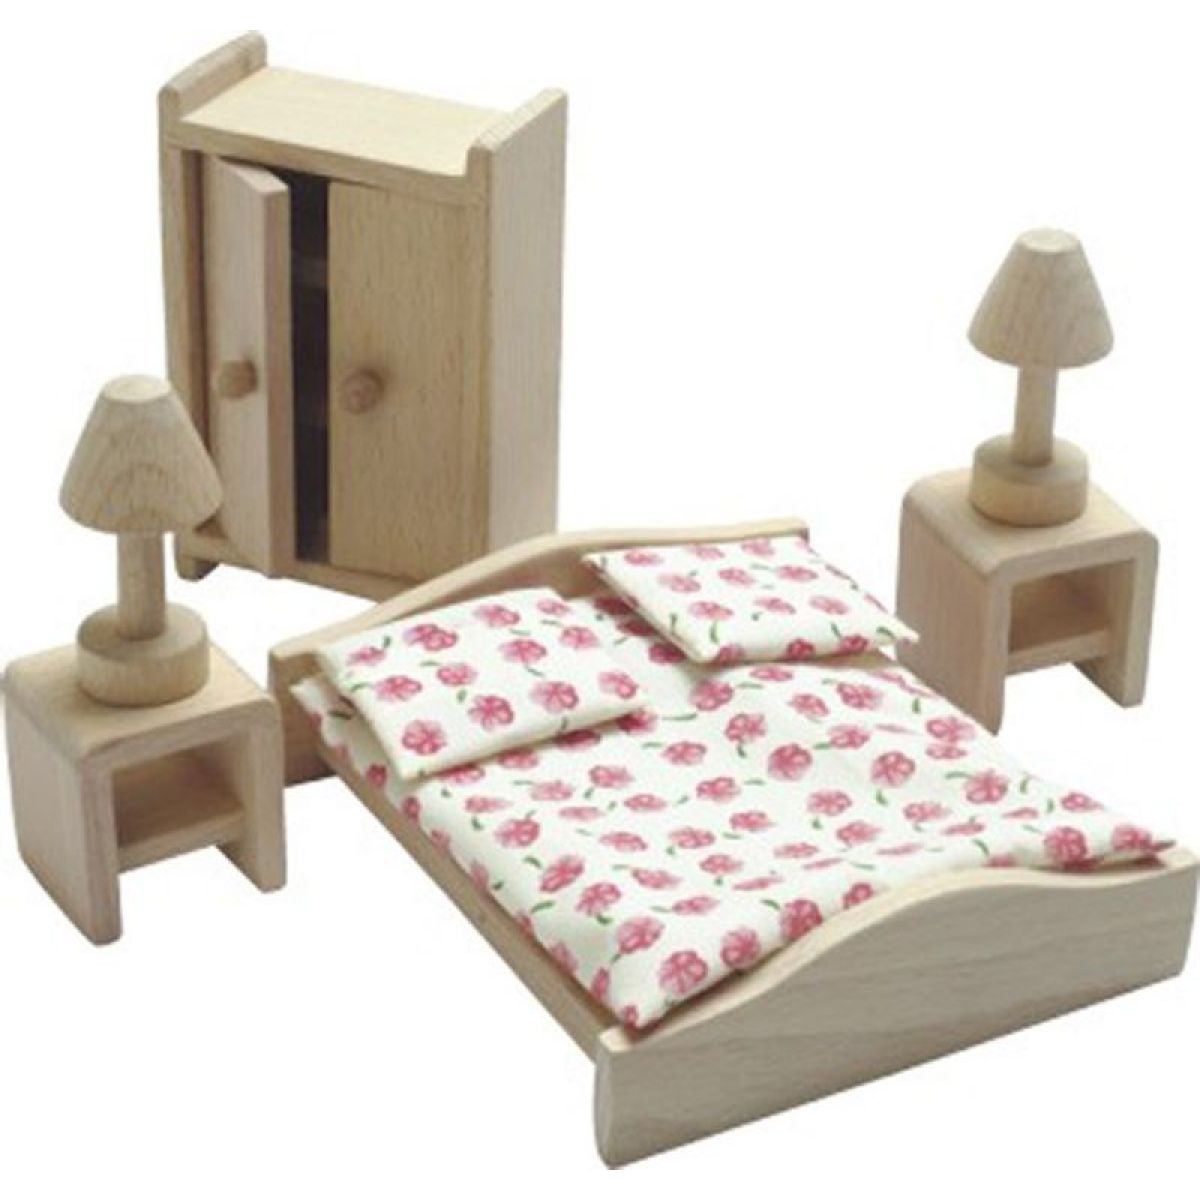 HM STUDIO Mini nábytek ložnice